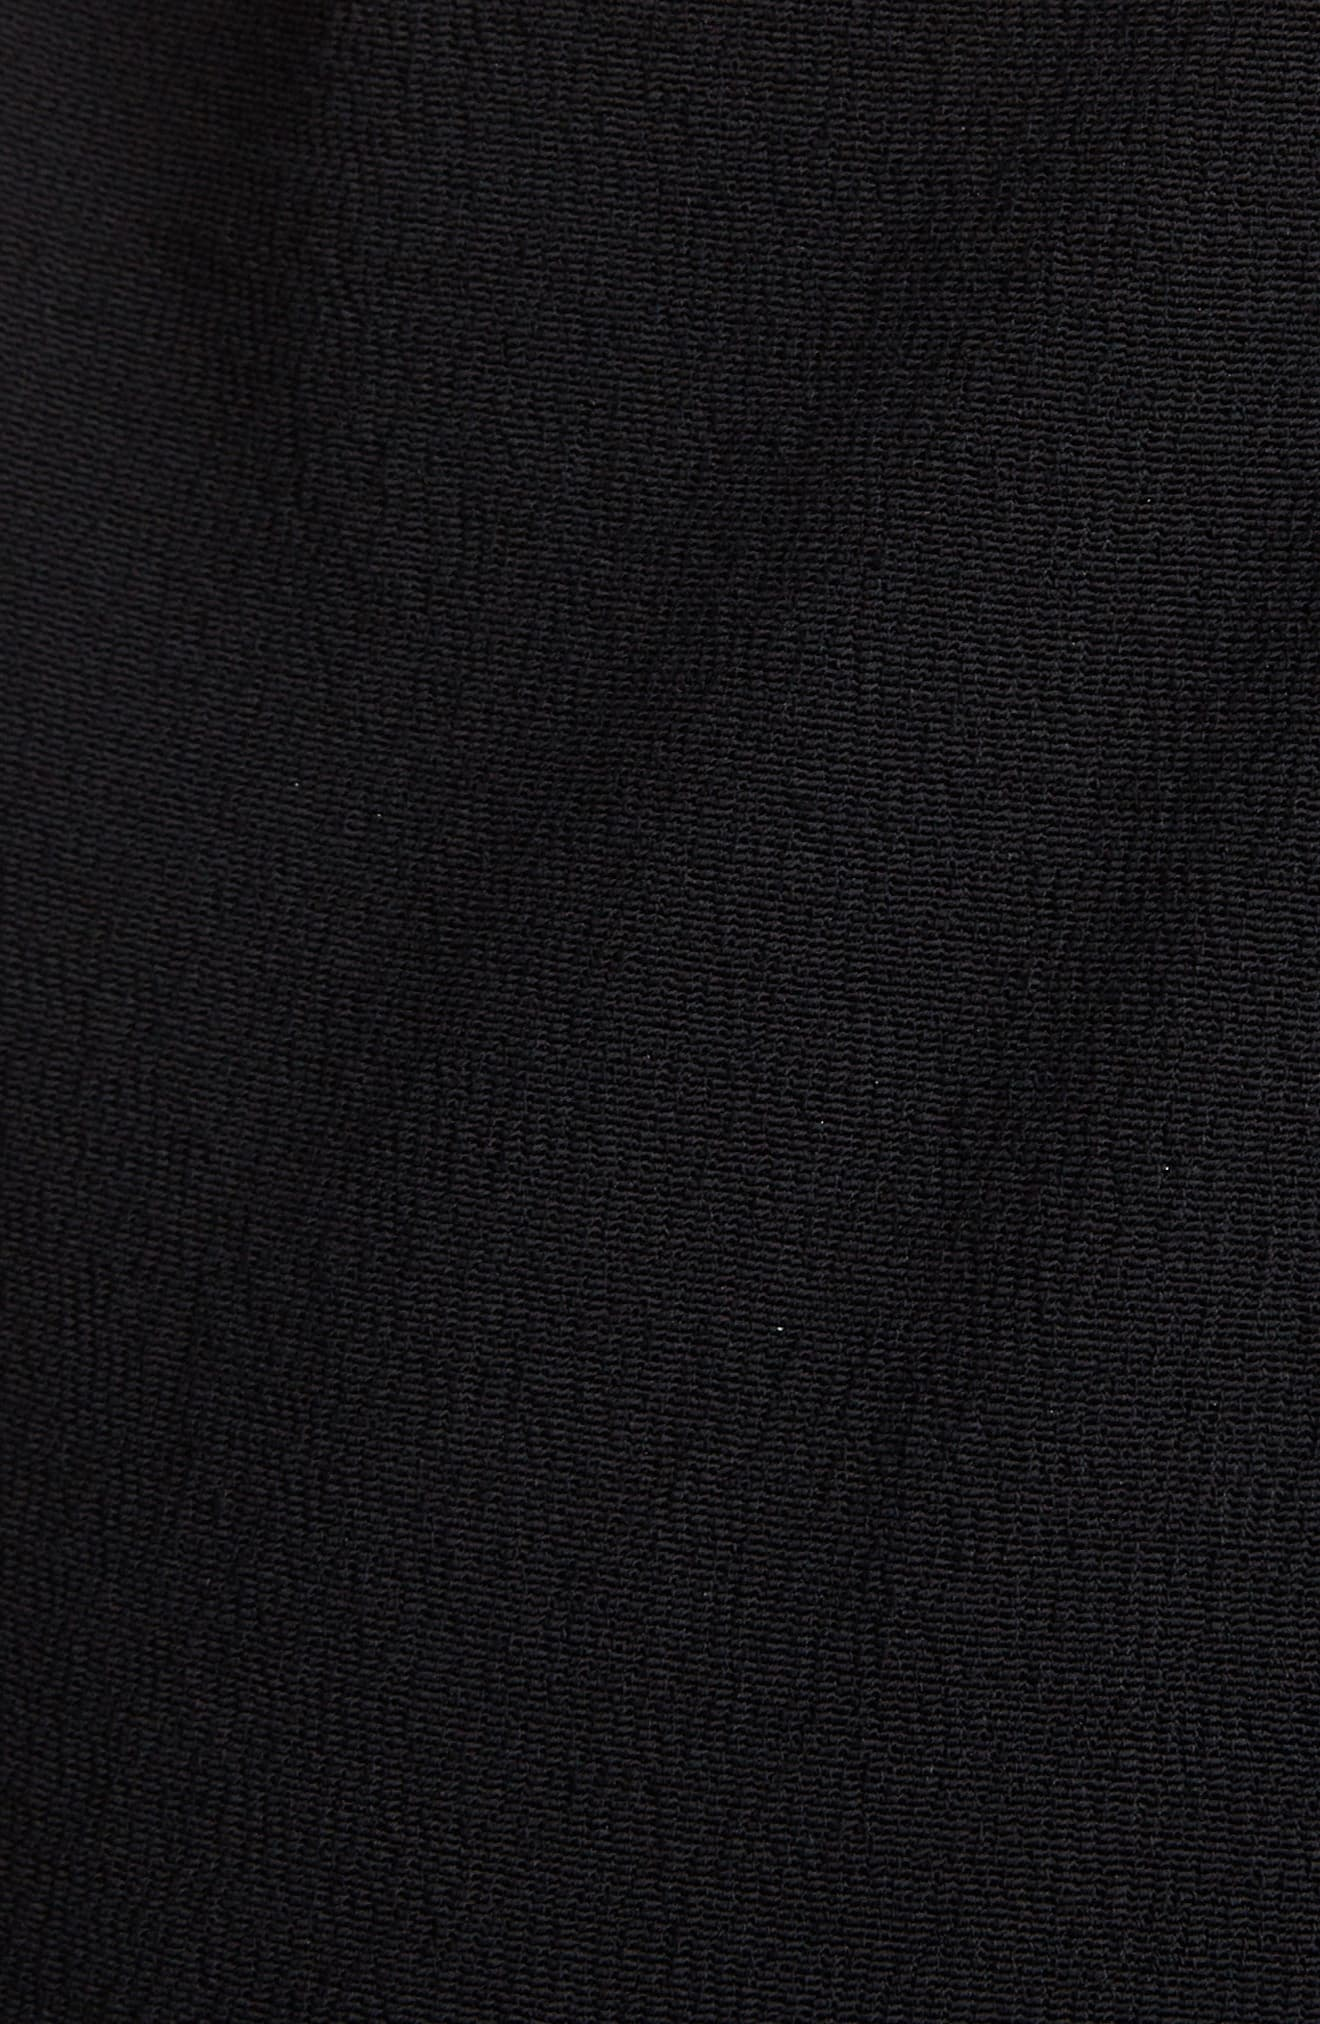 RICK OWENS Back Cutout Sheath Dress